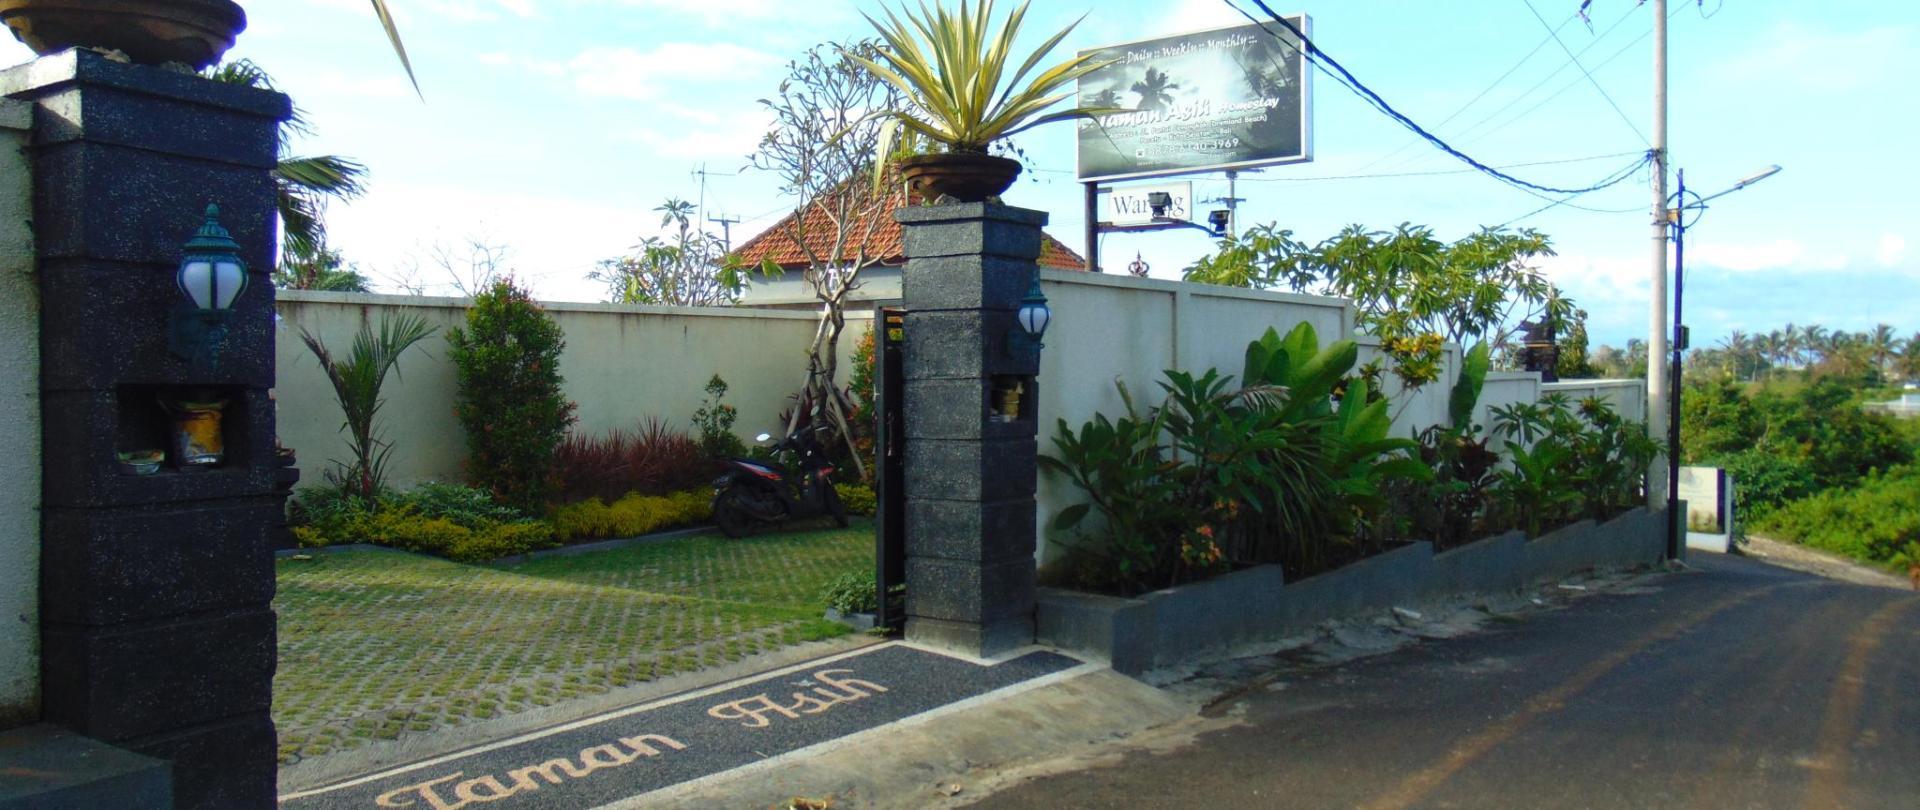 07. Hotel Front_04.JPG